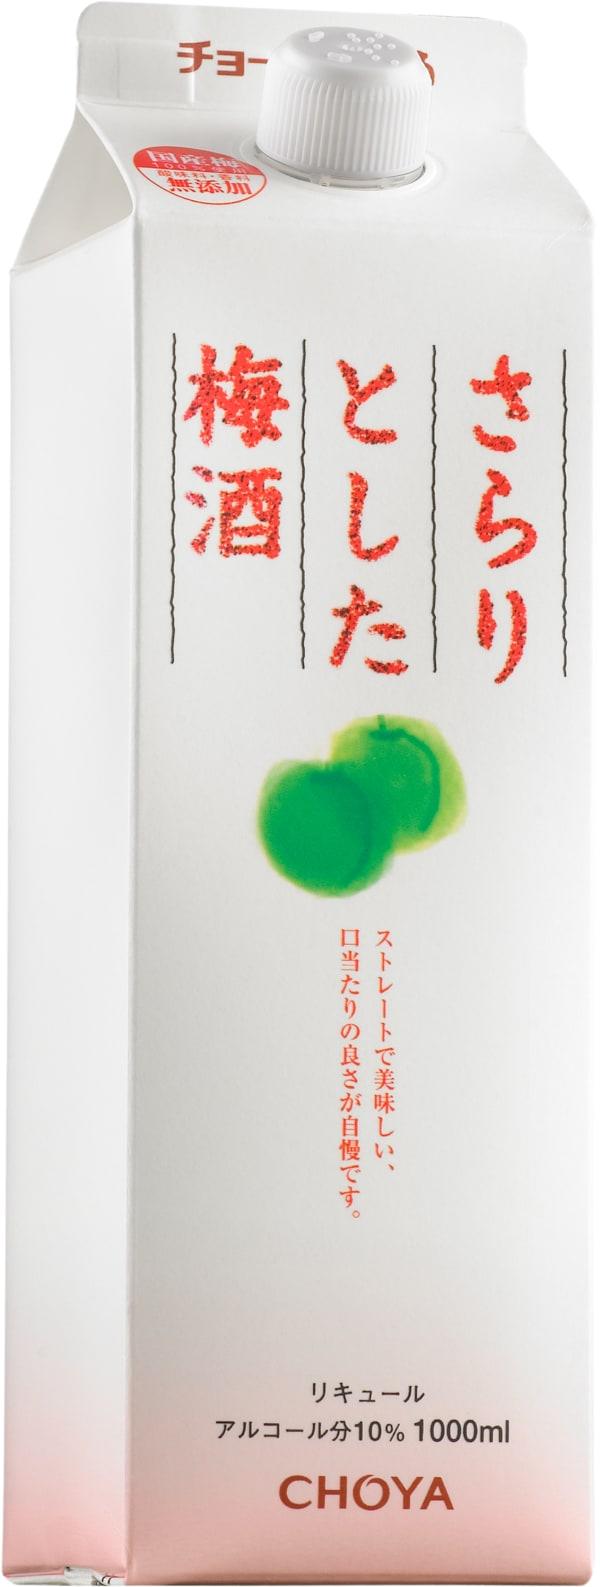 Umeshu Sarari  kartongförpackning